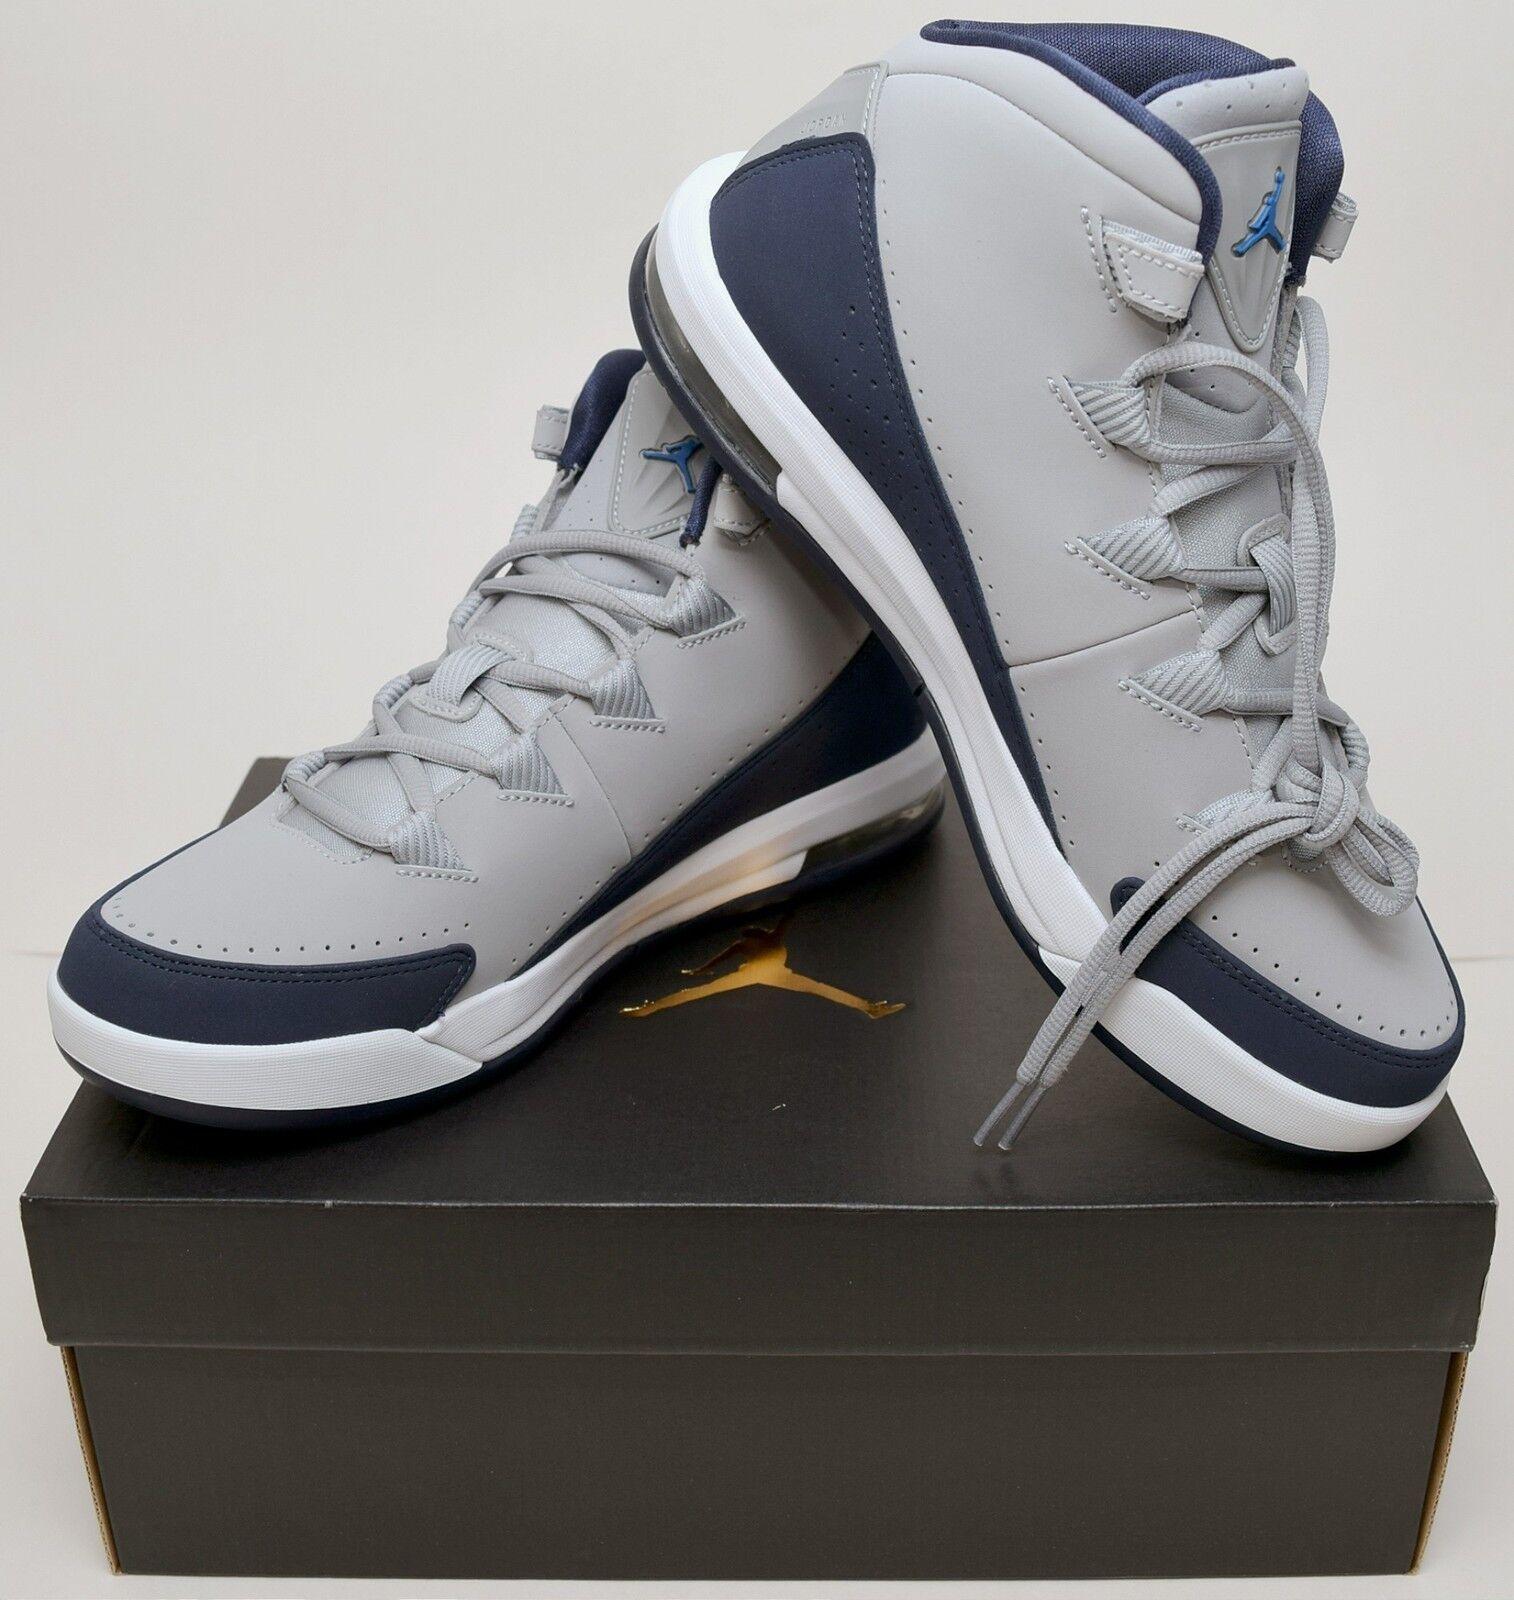 NEW GENUINE Nike Mens Size 8.5 Grey Jordan Air Deluxe Basketball Shoe 807717-006